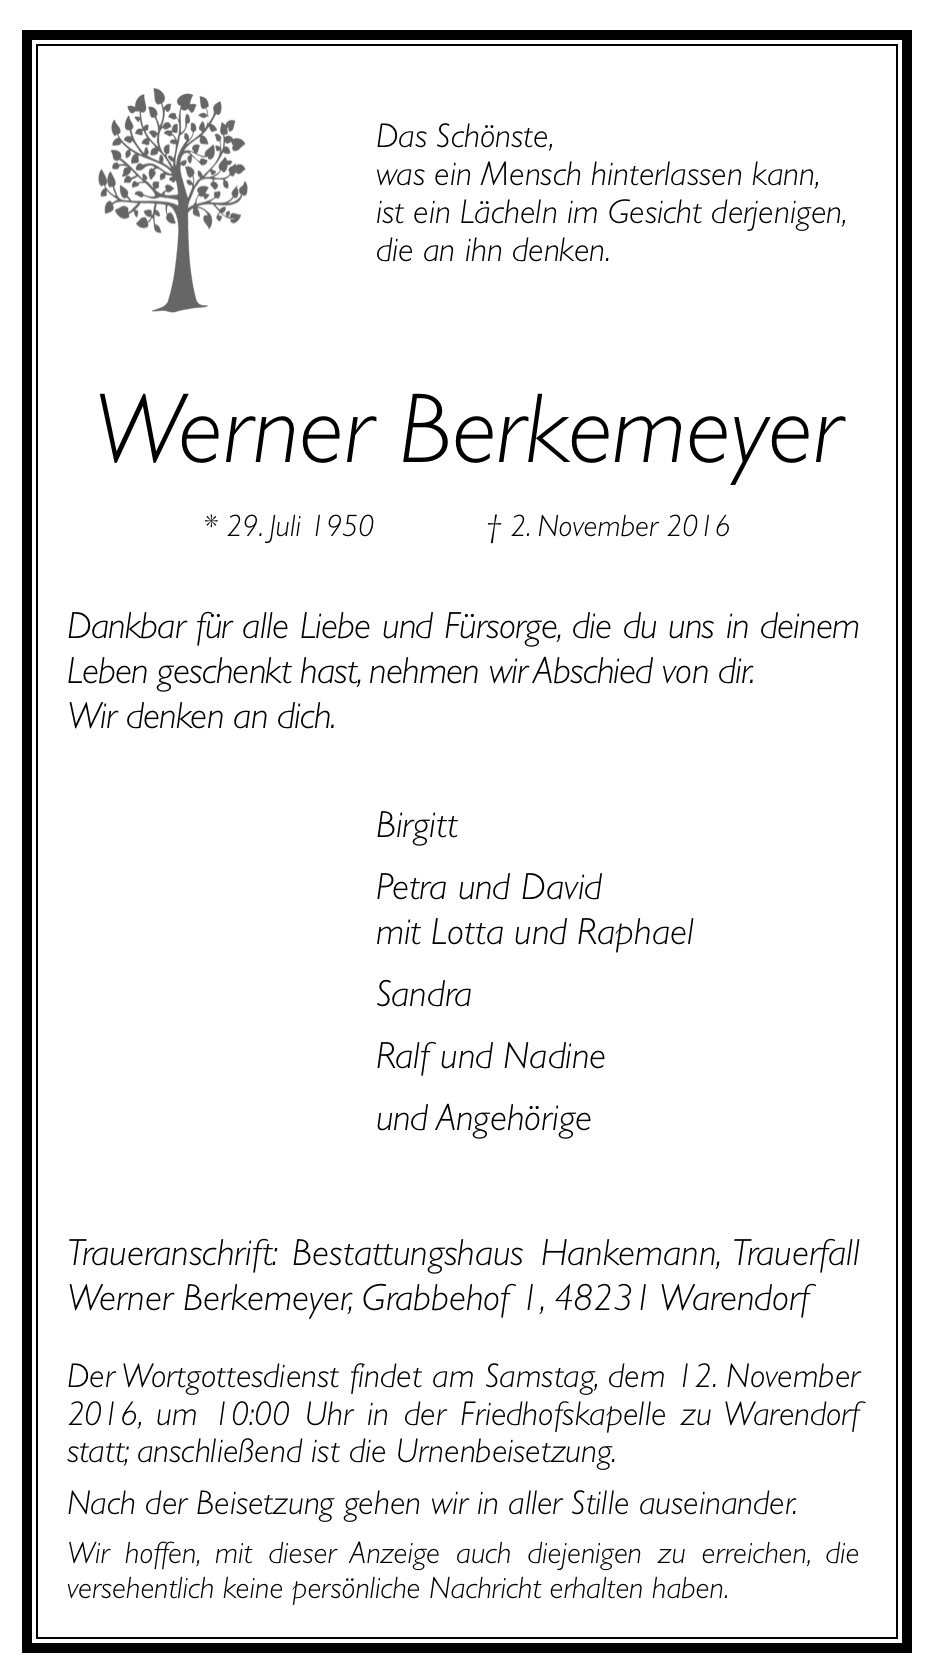 berkemeyer-werner